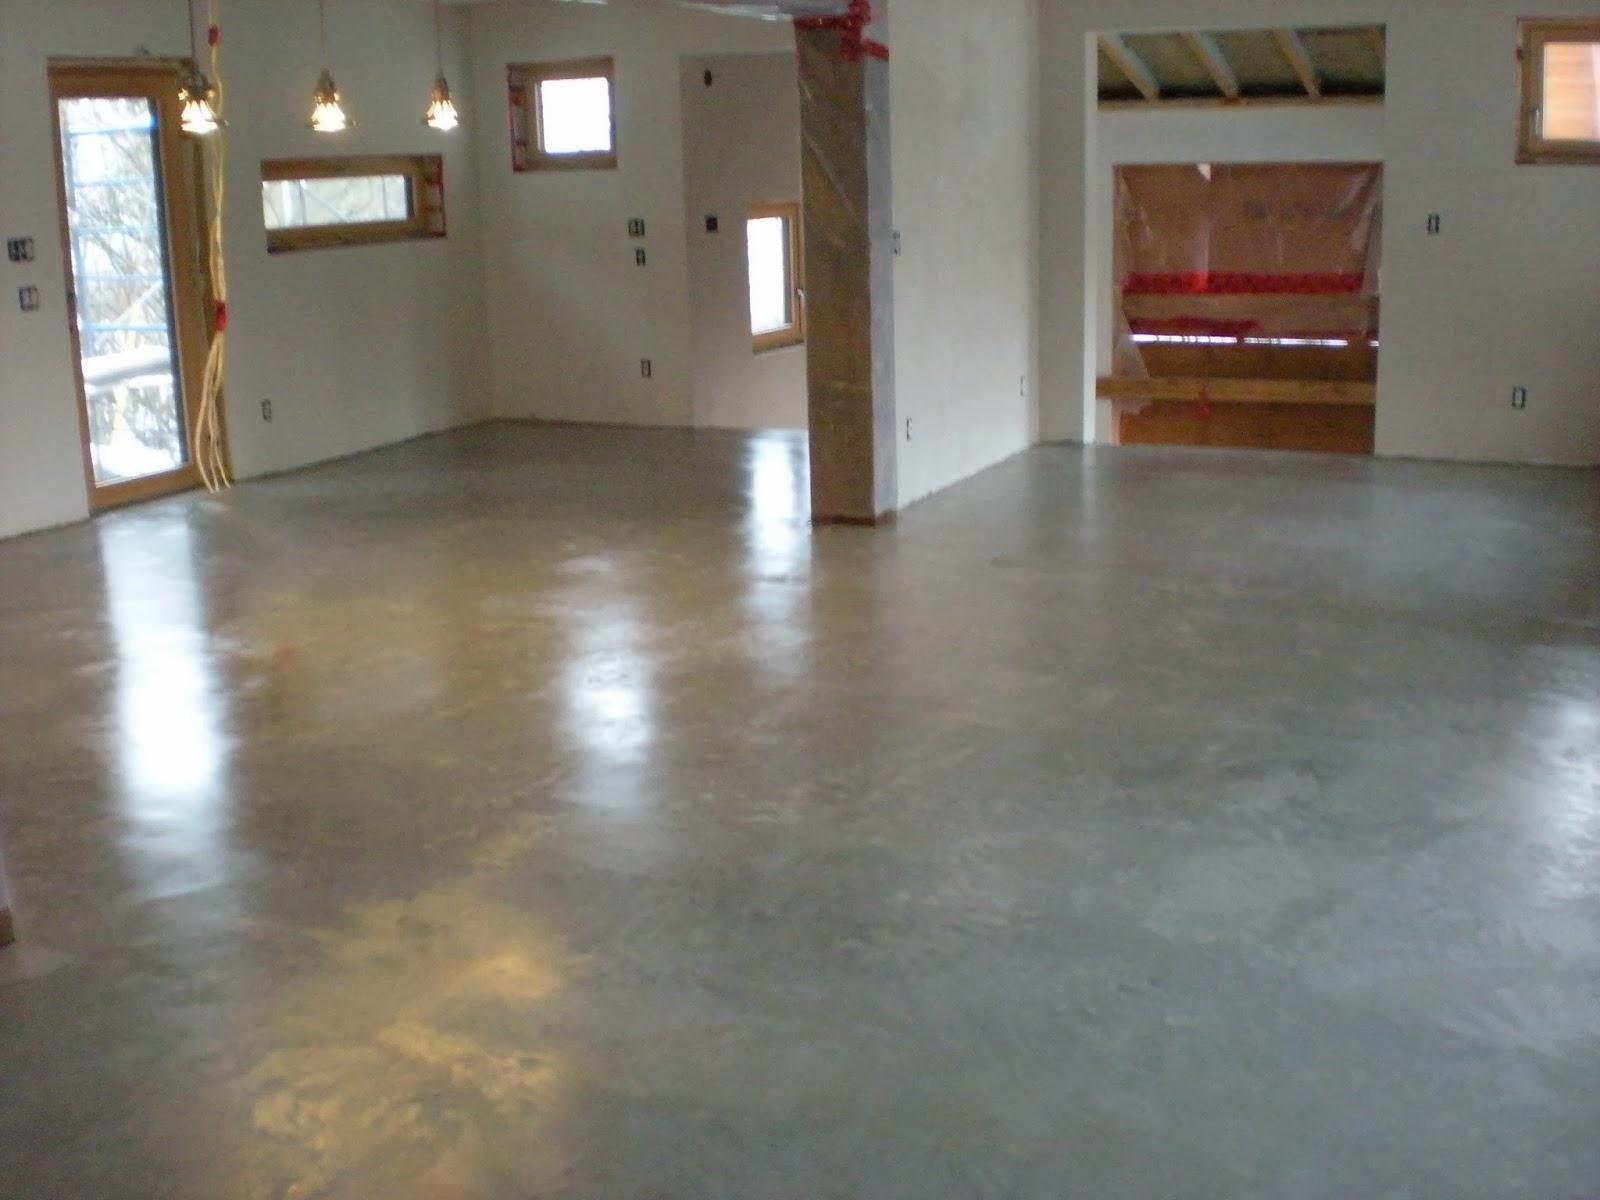 MODE CONCRETE: Considering Concrete Floors? Main Benefits